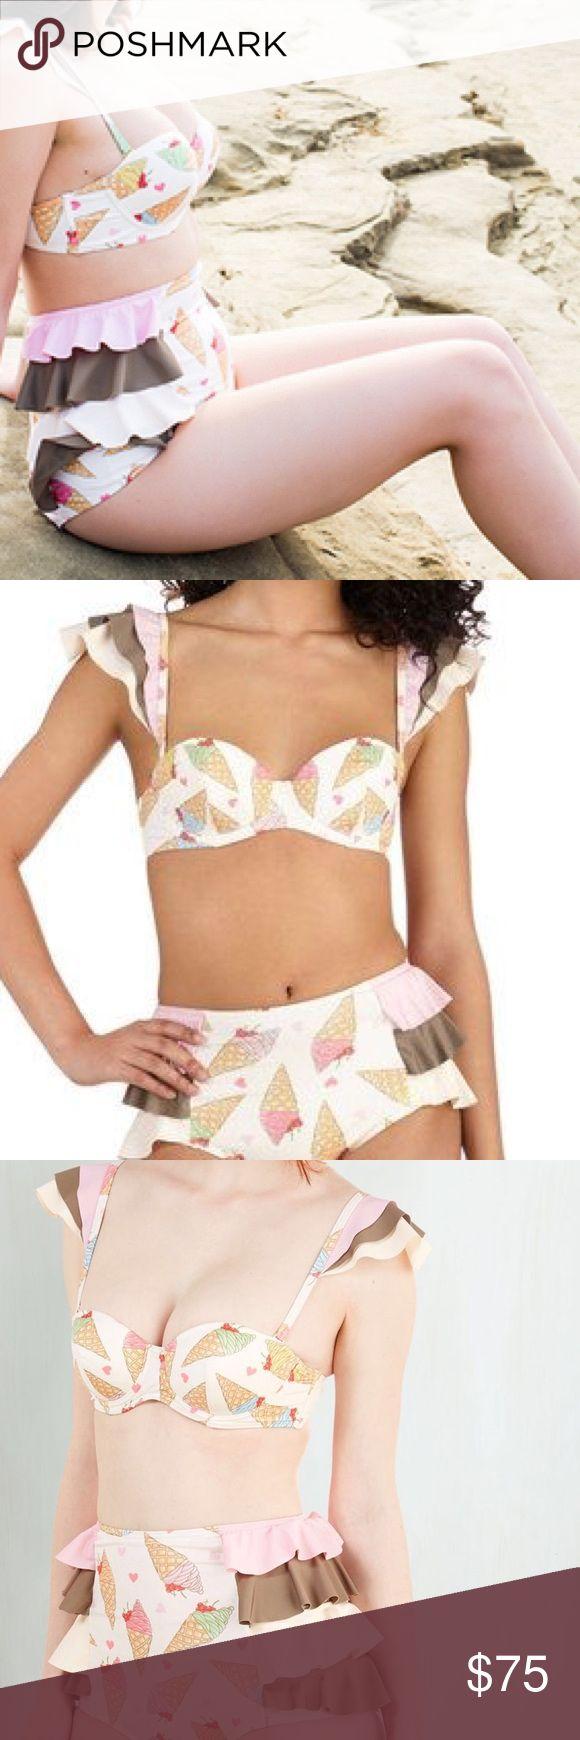 Retro High waist ice cream bikini, XS Fits A-B cup Fits A-B cup. Sold out online. Size XS ModCloth Swim Bikinis